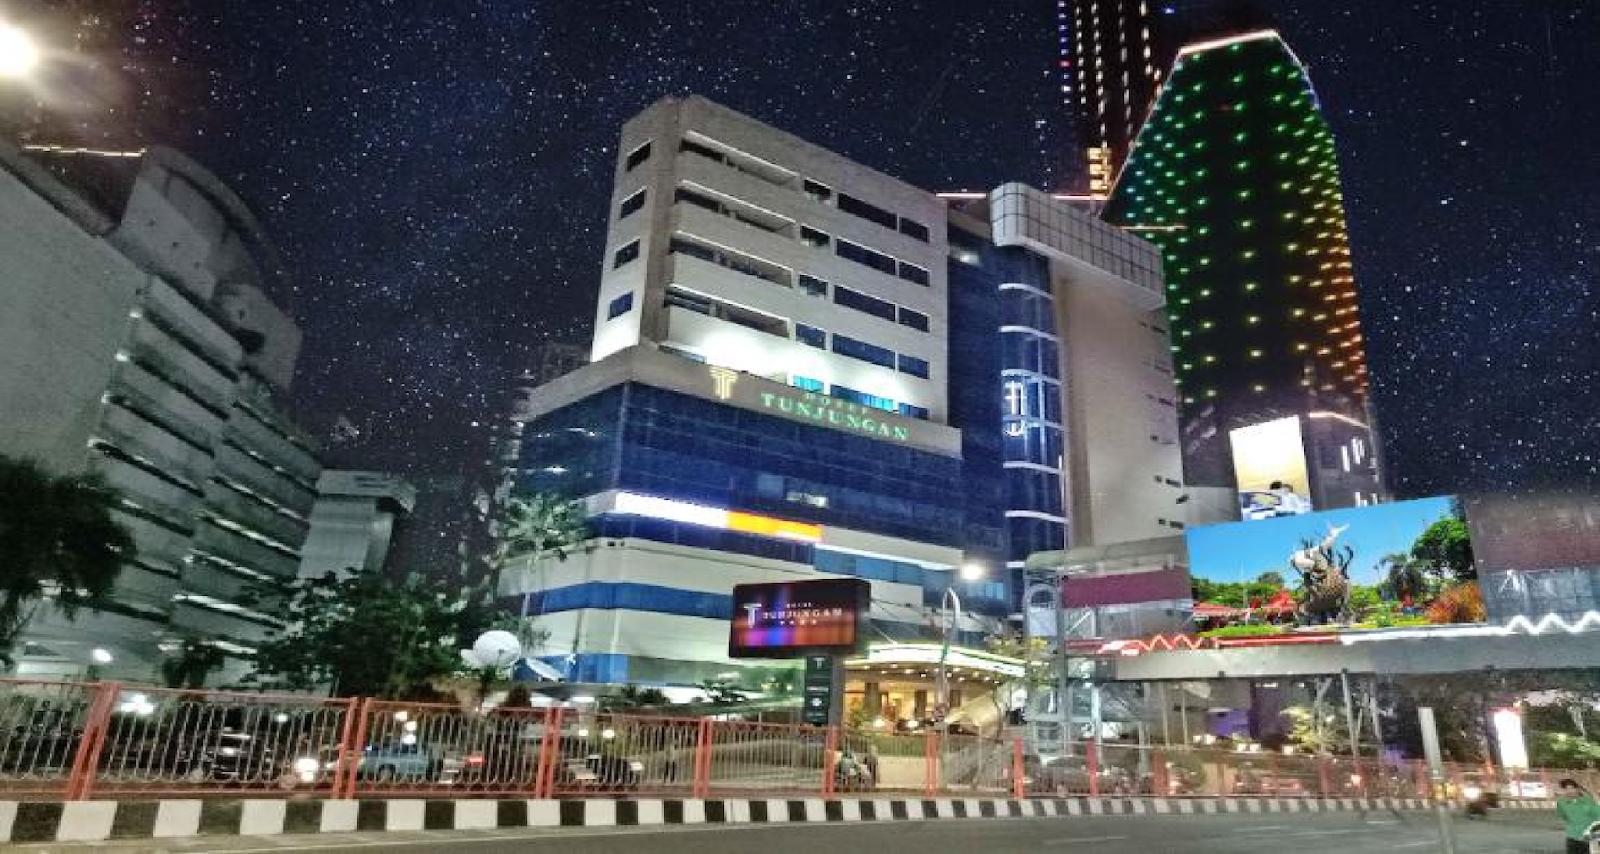 Tunjangan Hotel Bintang 4 di Surabaya